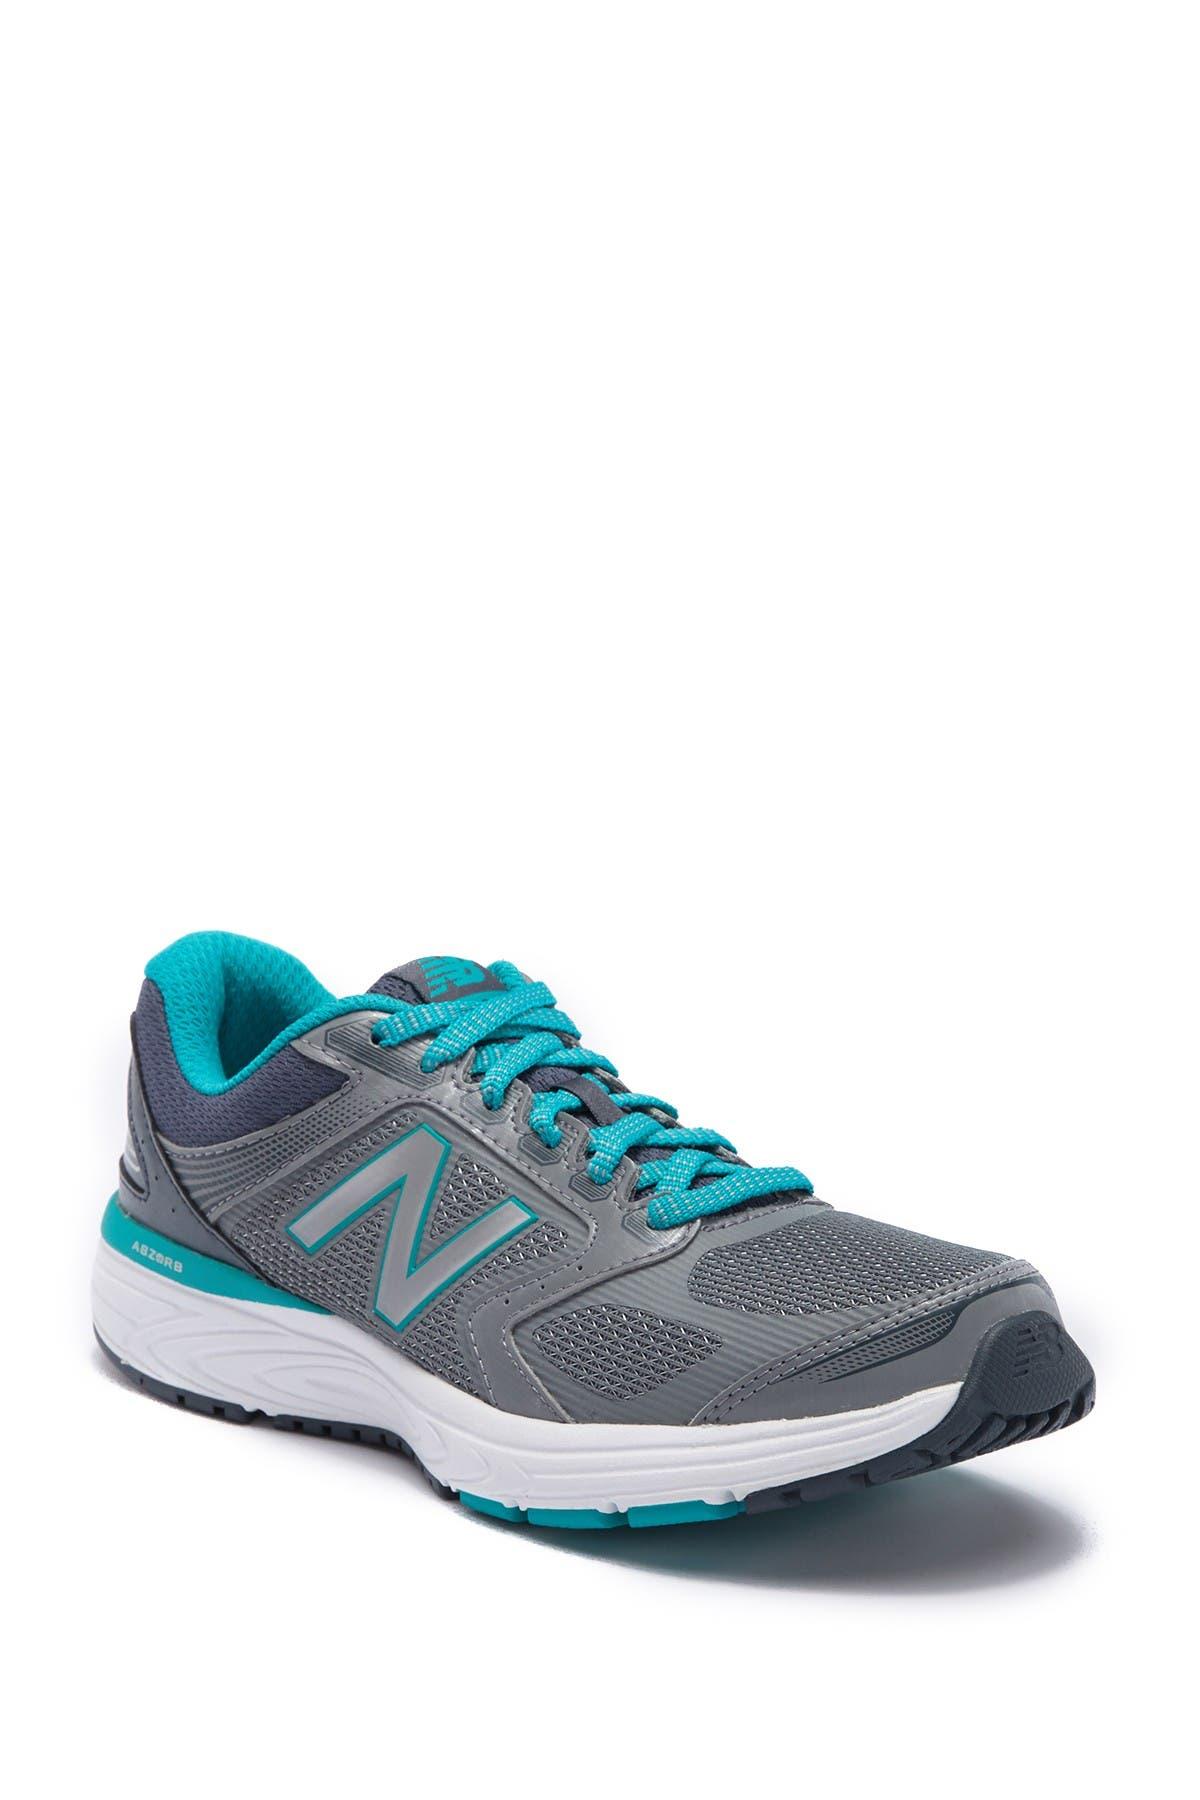 itálico práctico Menos  New Balance | 560v7 Abzorb Running Shoe | Nordstrom Rack